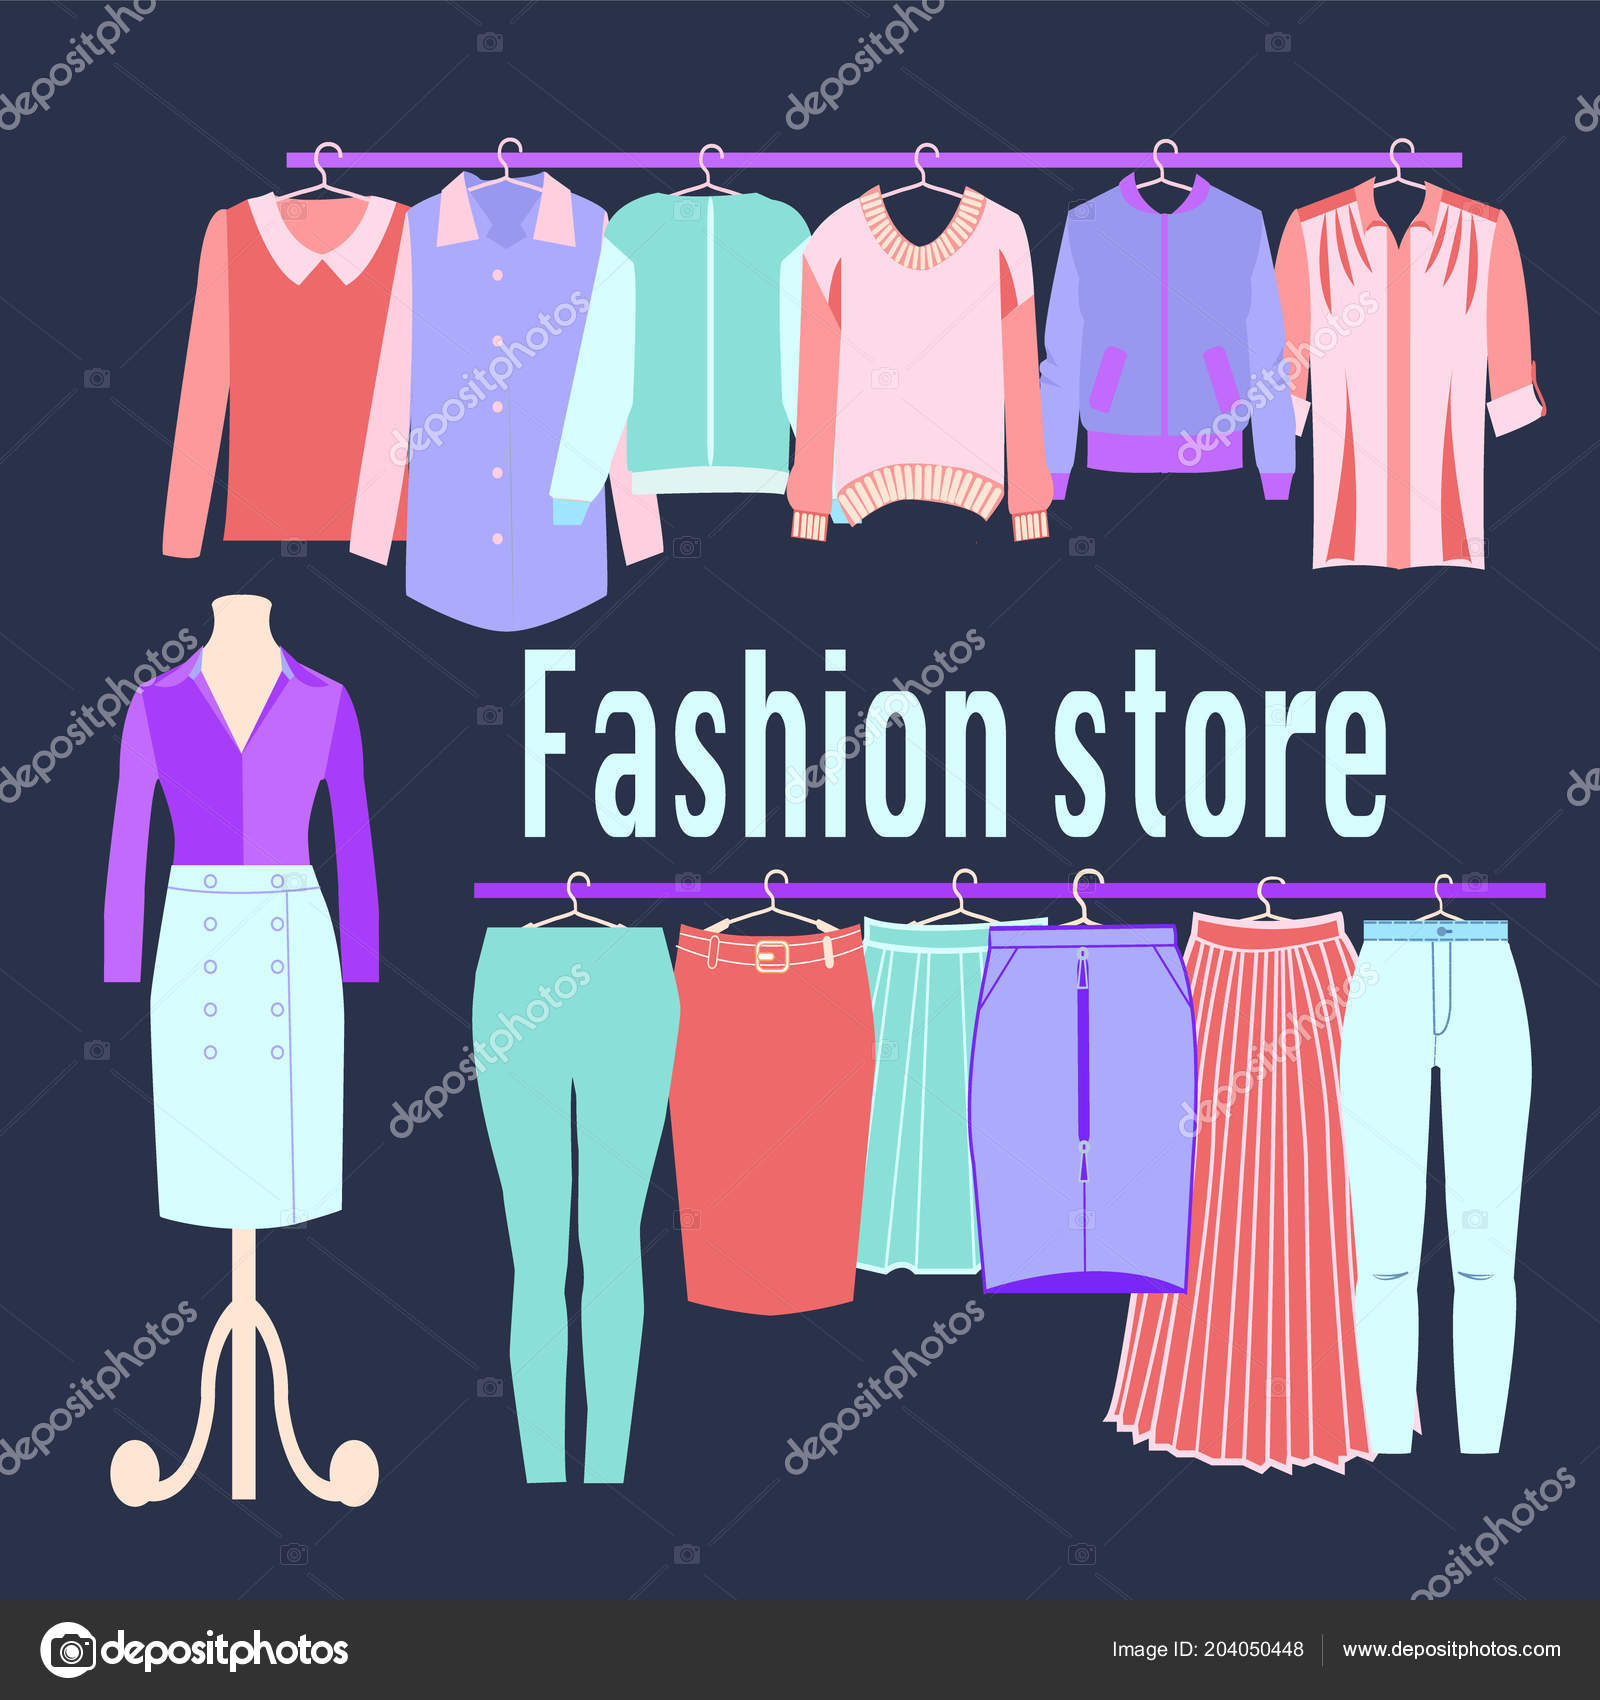 Background Boutique Design Clothing Store Background Boutique Fashion Store Flat Design Vector Illustration Stock Vector C Margolana 204050448